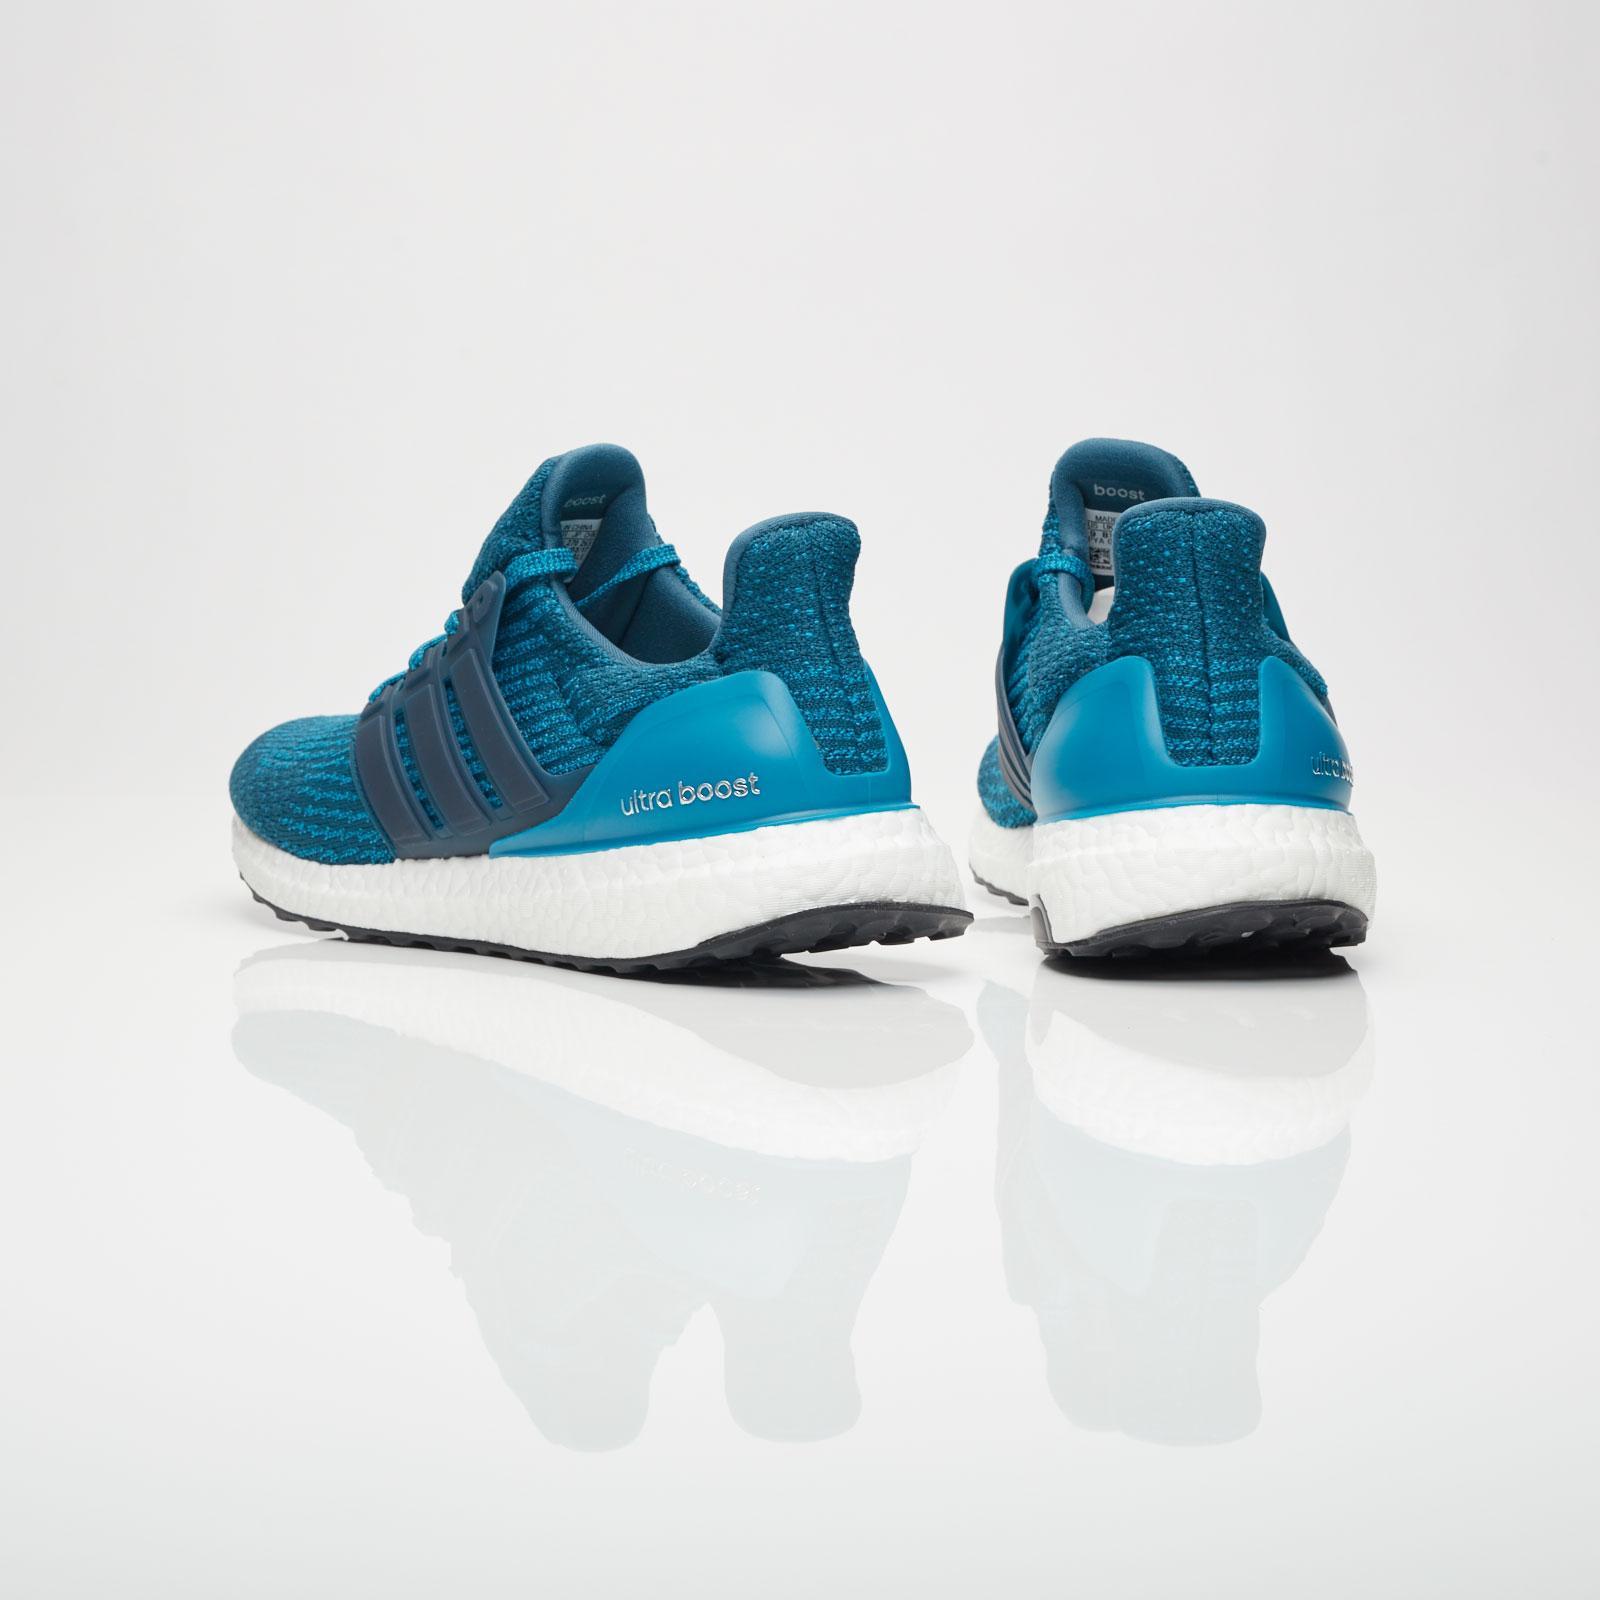 47c7901a1 adidas UltraBOOST - S82021 - Sneakersnstuff